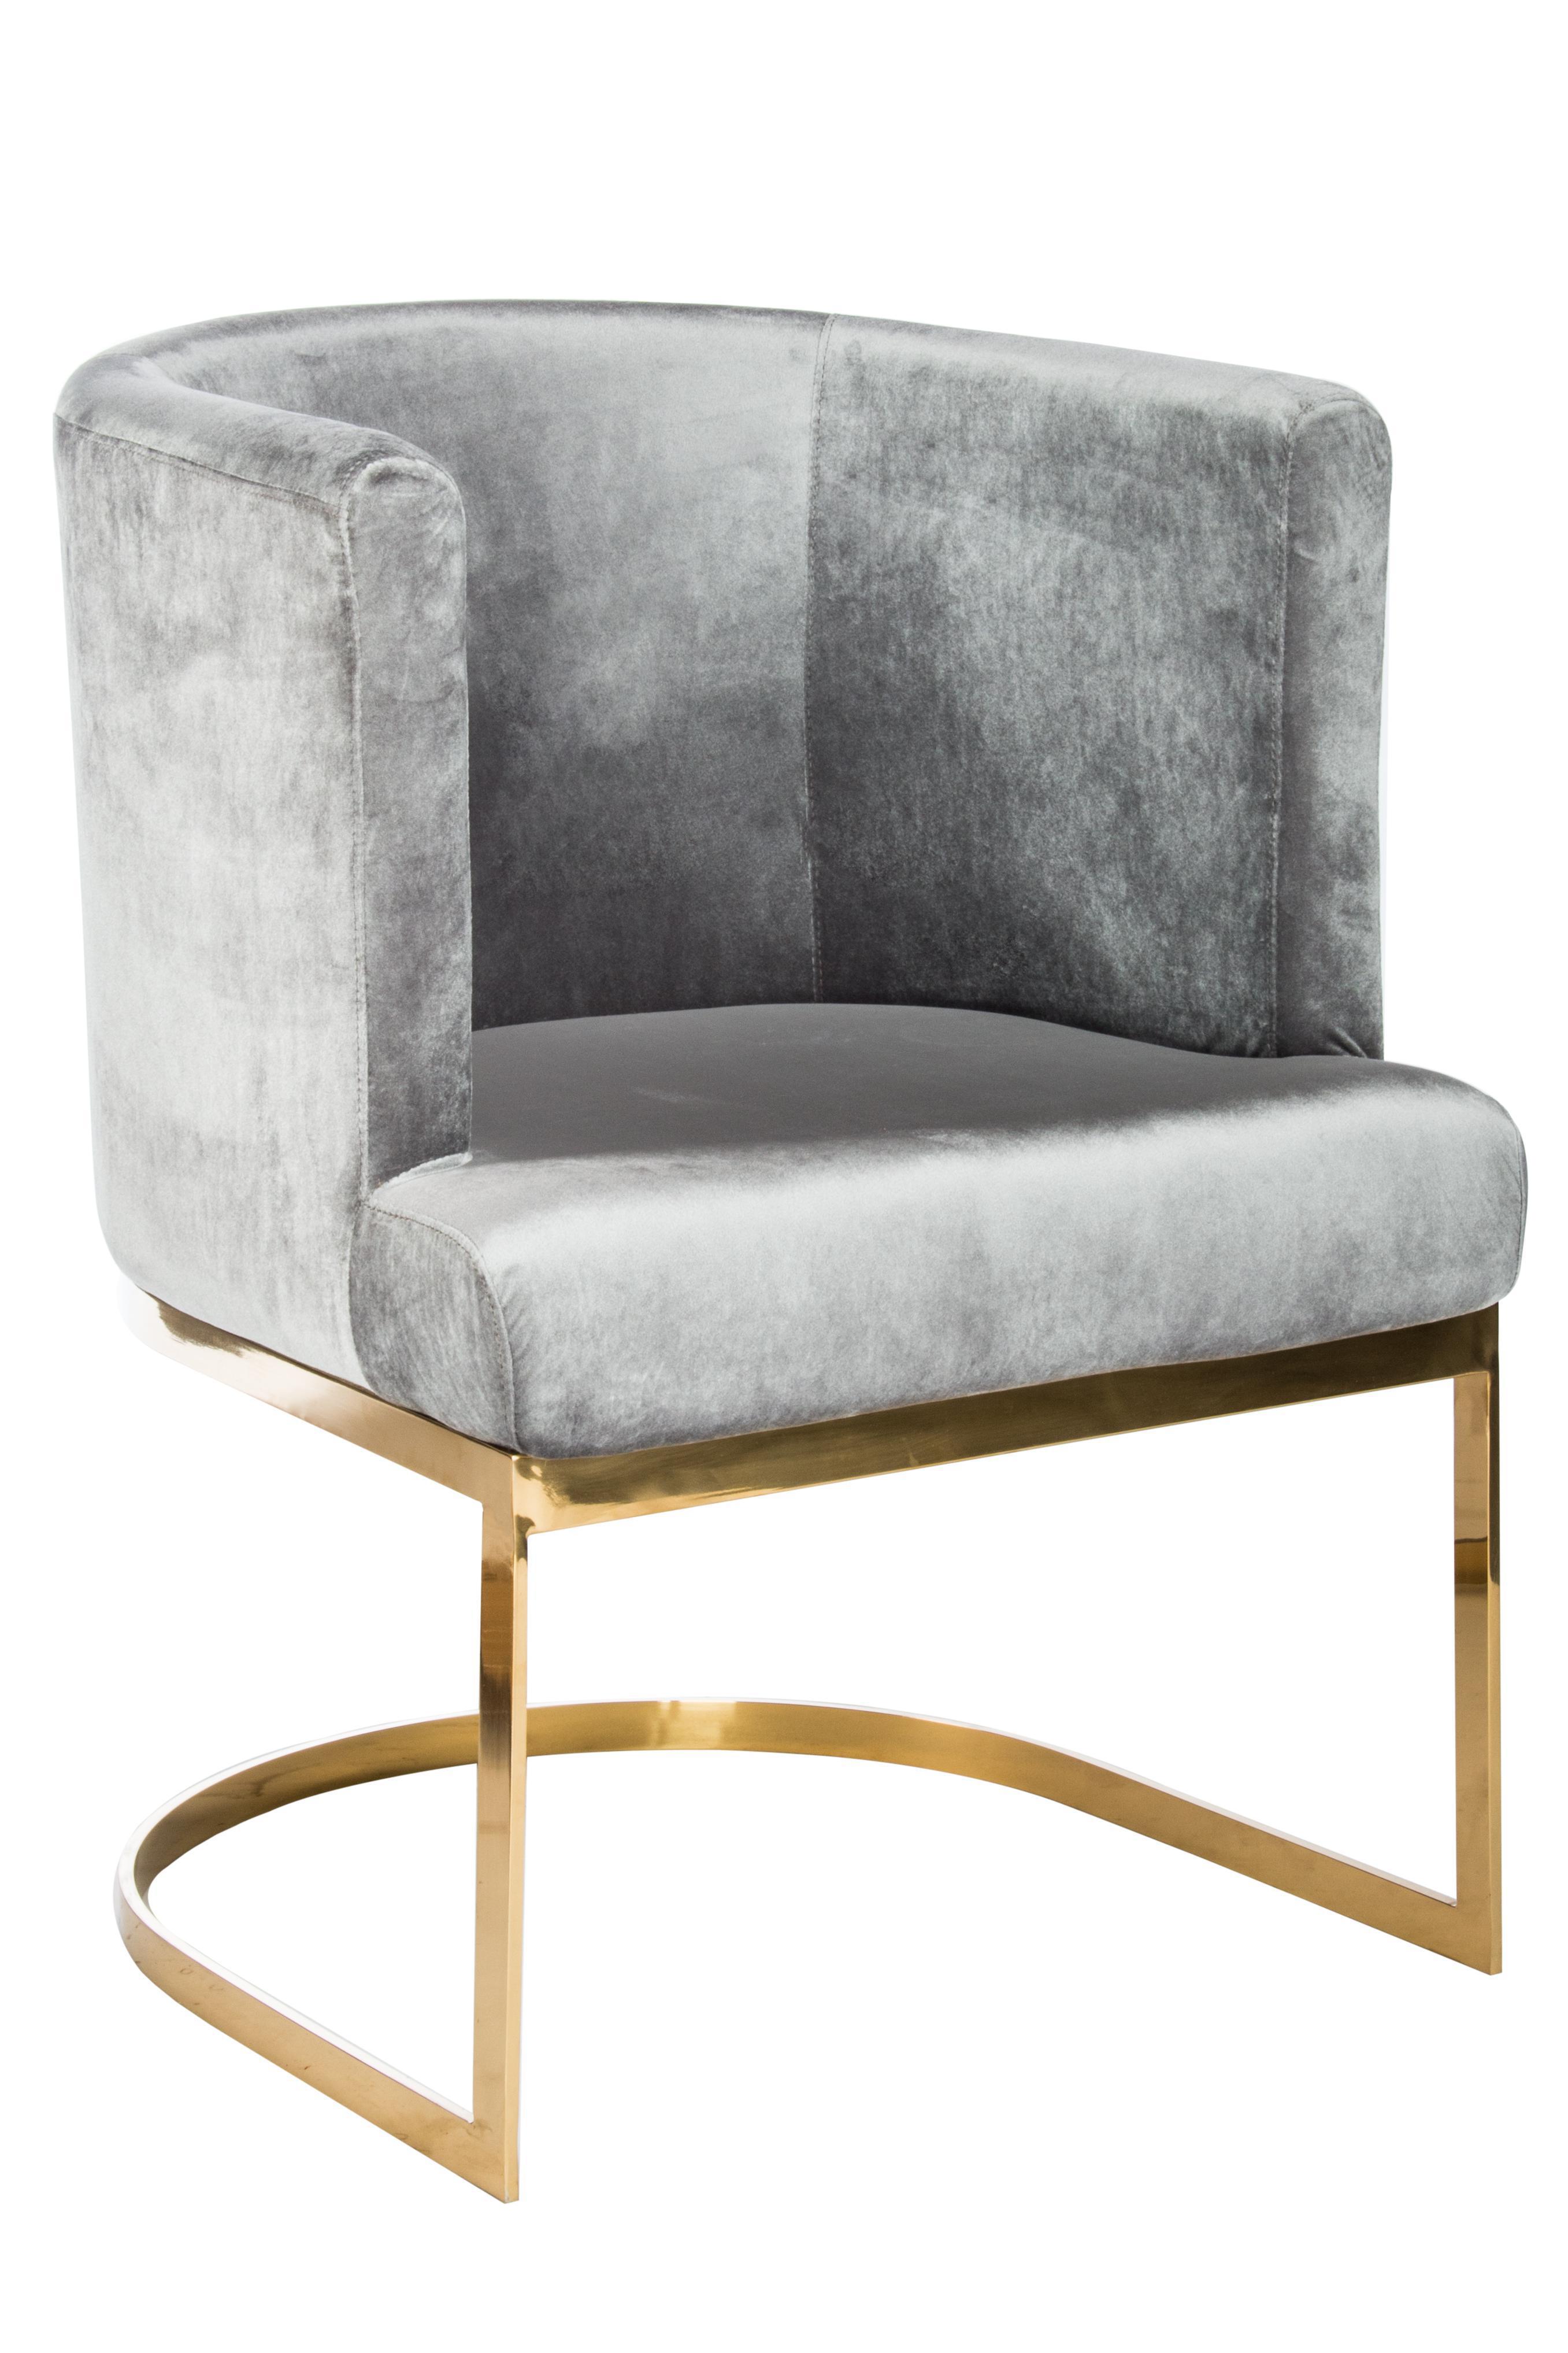 Circular Gray Velvet U0026 Gold Dining Chairs   Set Of 6